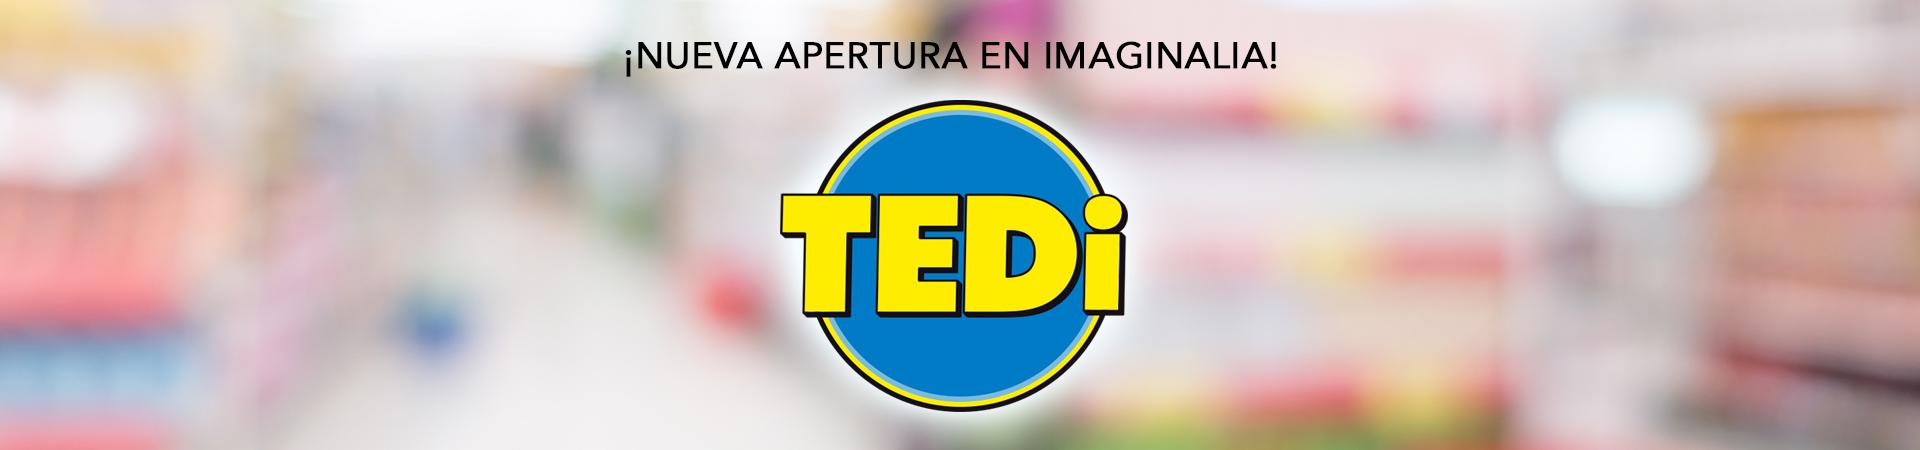 apertura-tedi-imaginalia